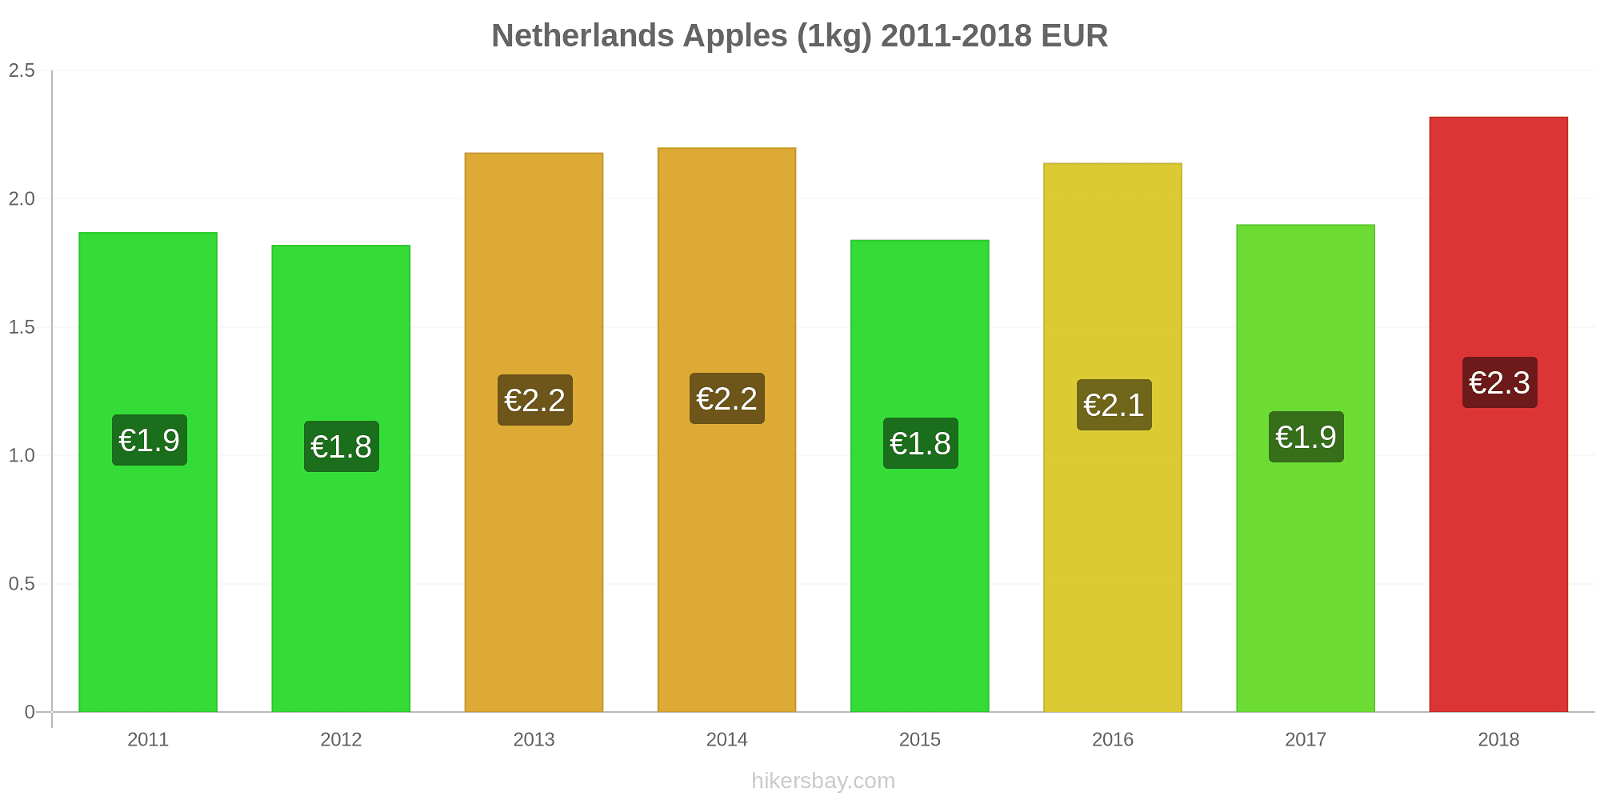 Netherlands price changes Apples (1kg) hikersbay.com